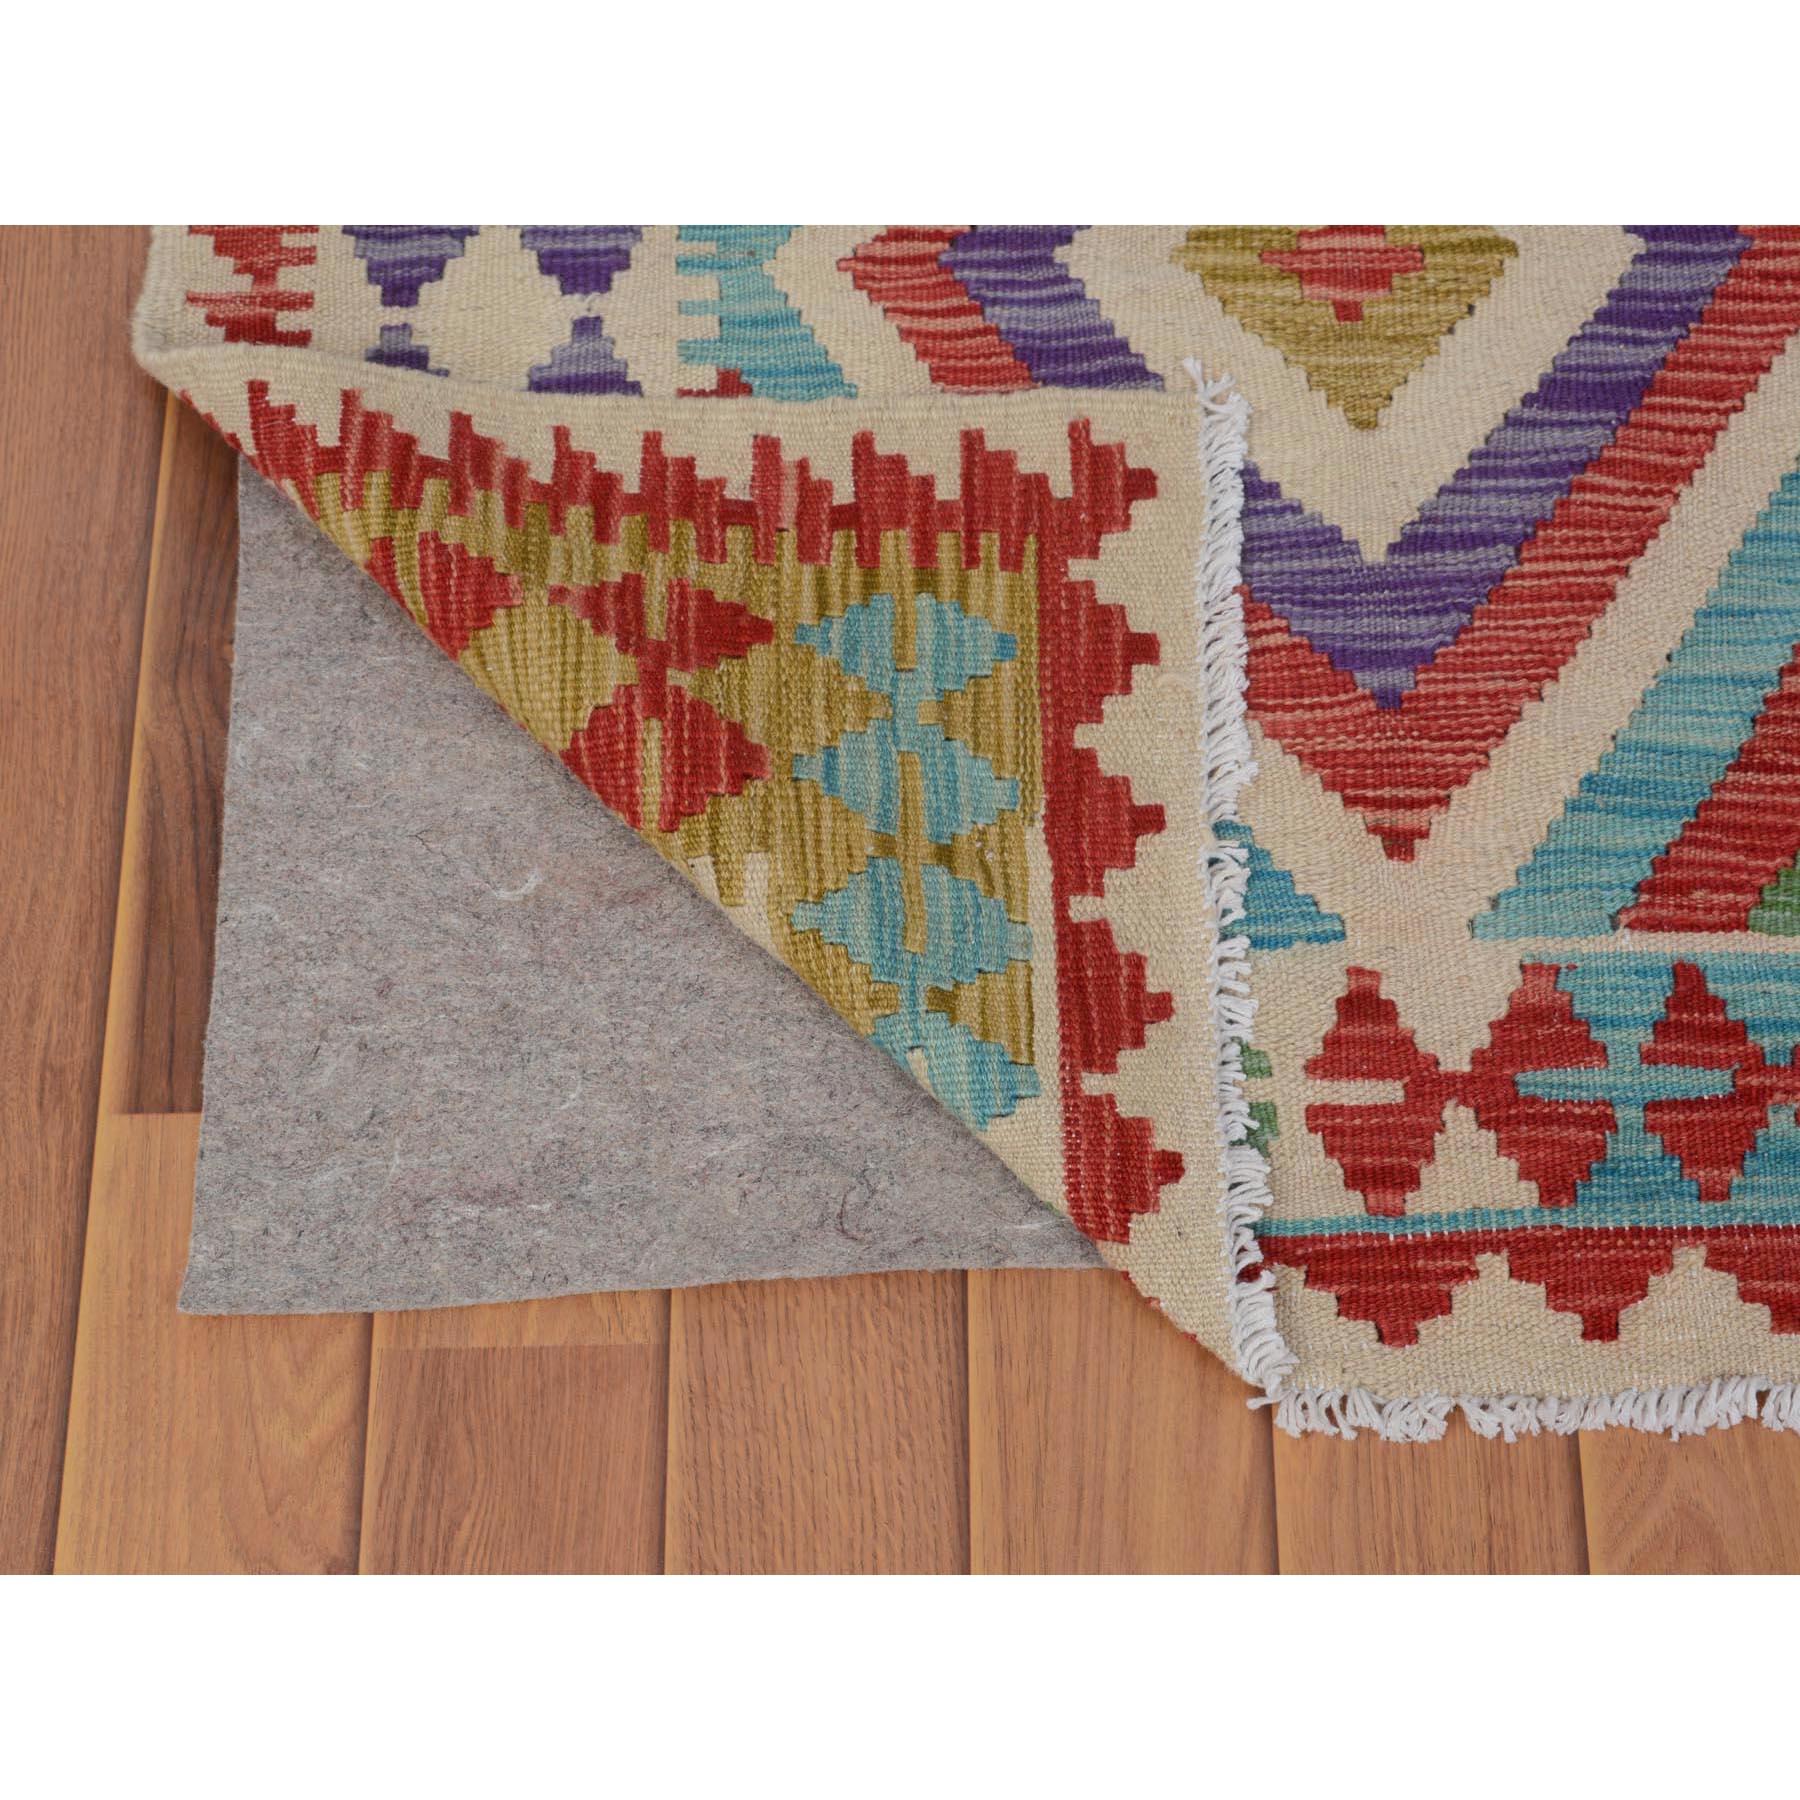 2-10 x4- Colorful Reversible Geometric Design Afghan Kilim Vegetable Dyes Pure Wool Hand Woven Oriental Rug